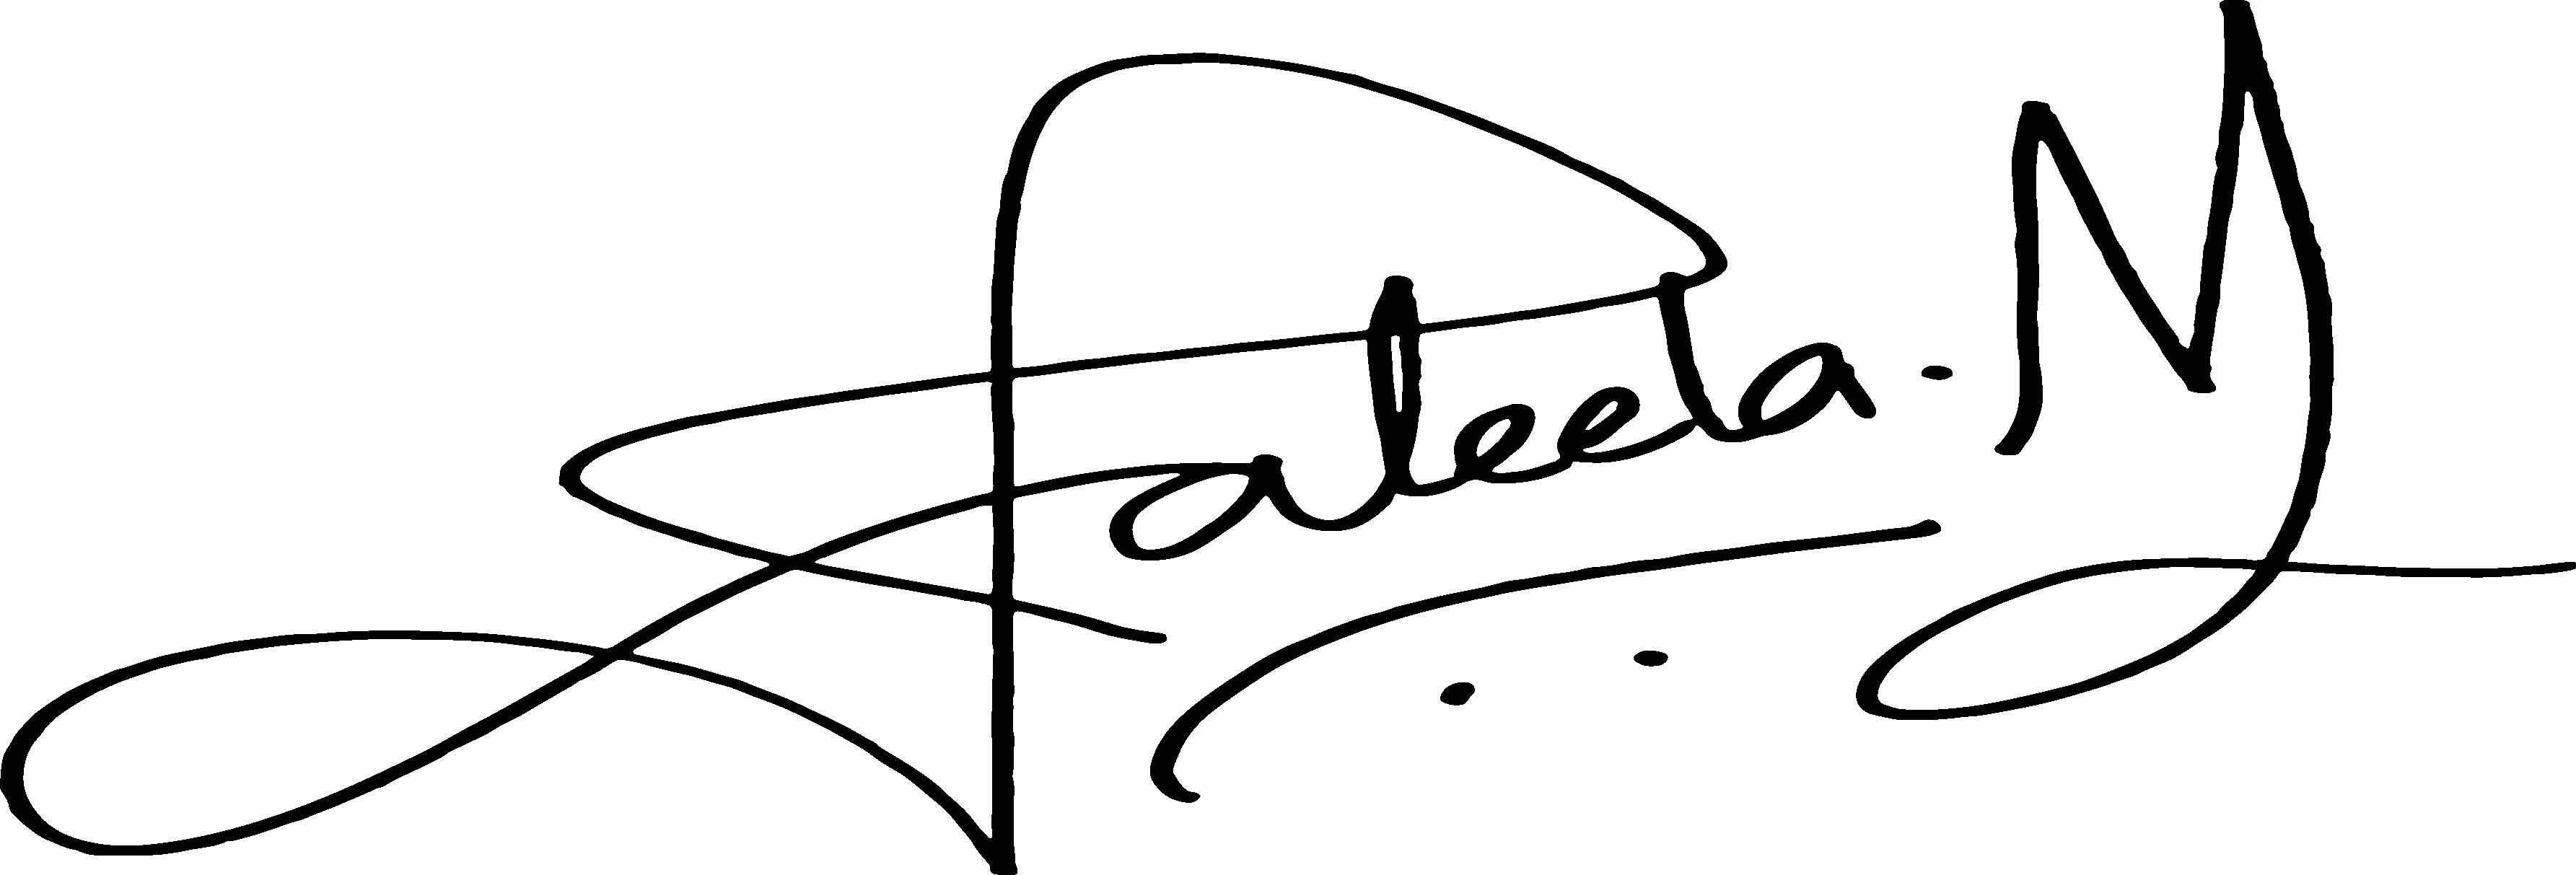 Jaleela Niaz Signature